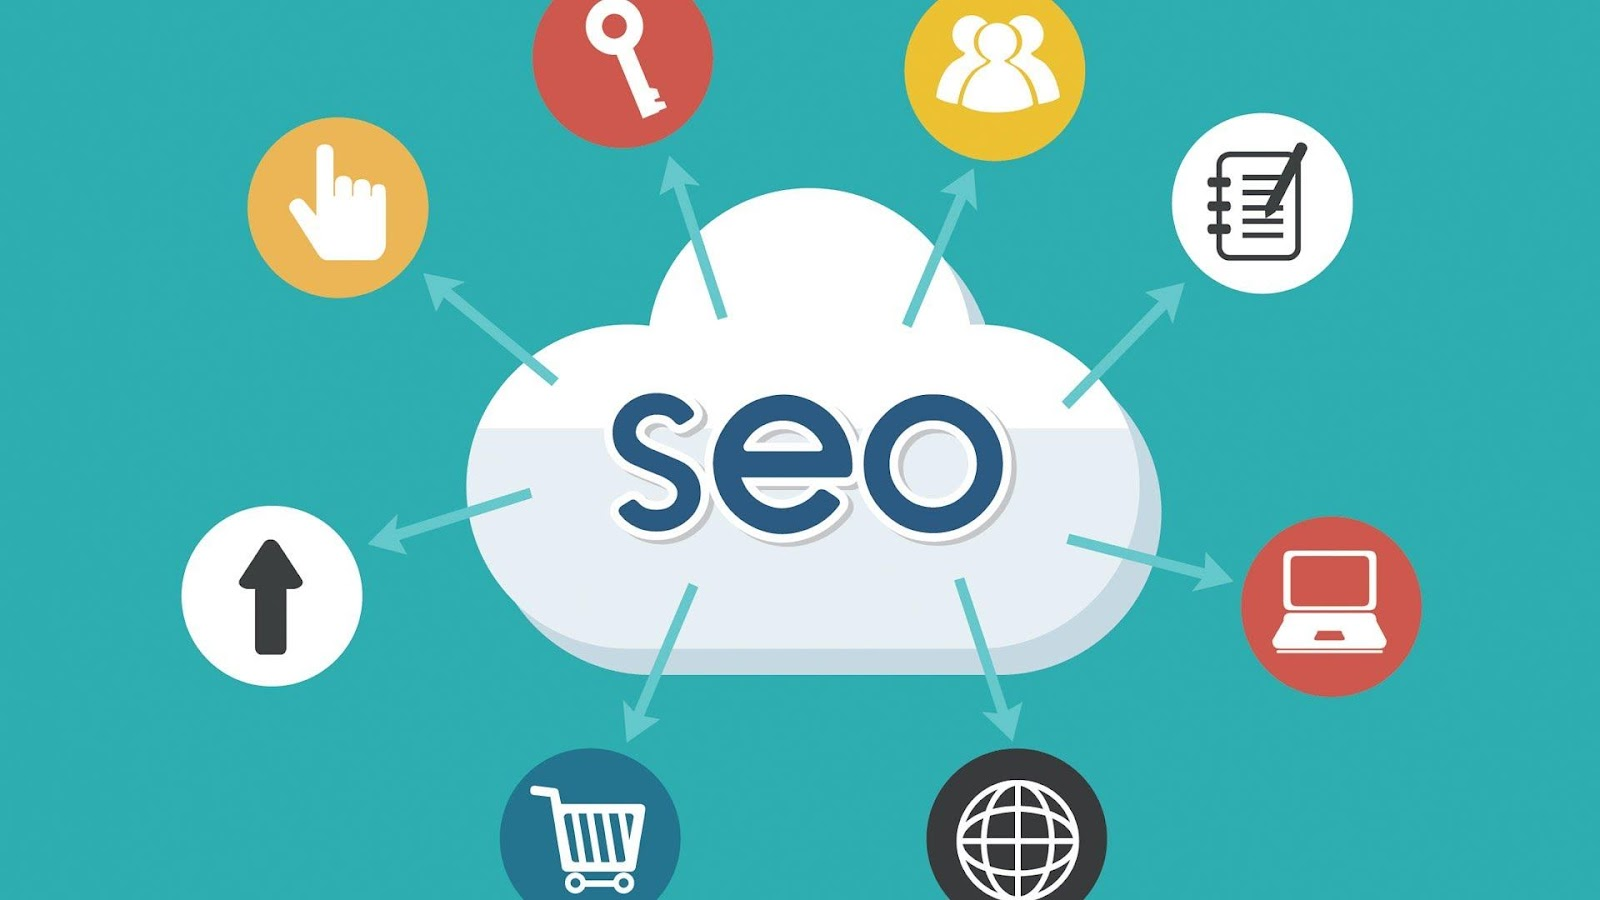 PPC cung cấp digital marketing service cực kỳ tốt